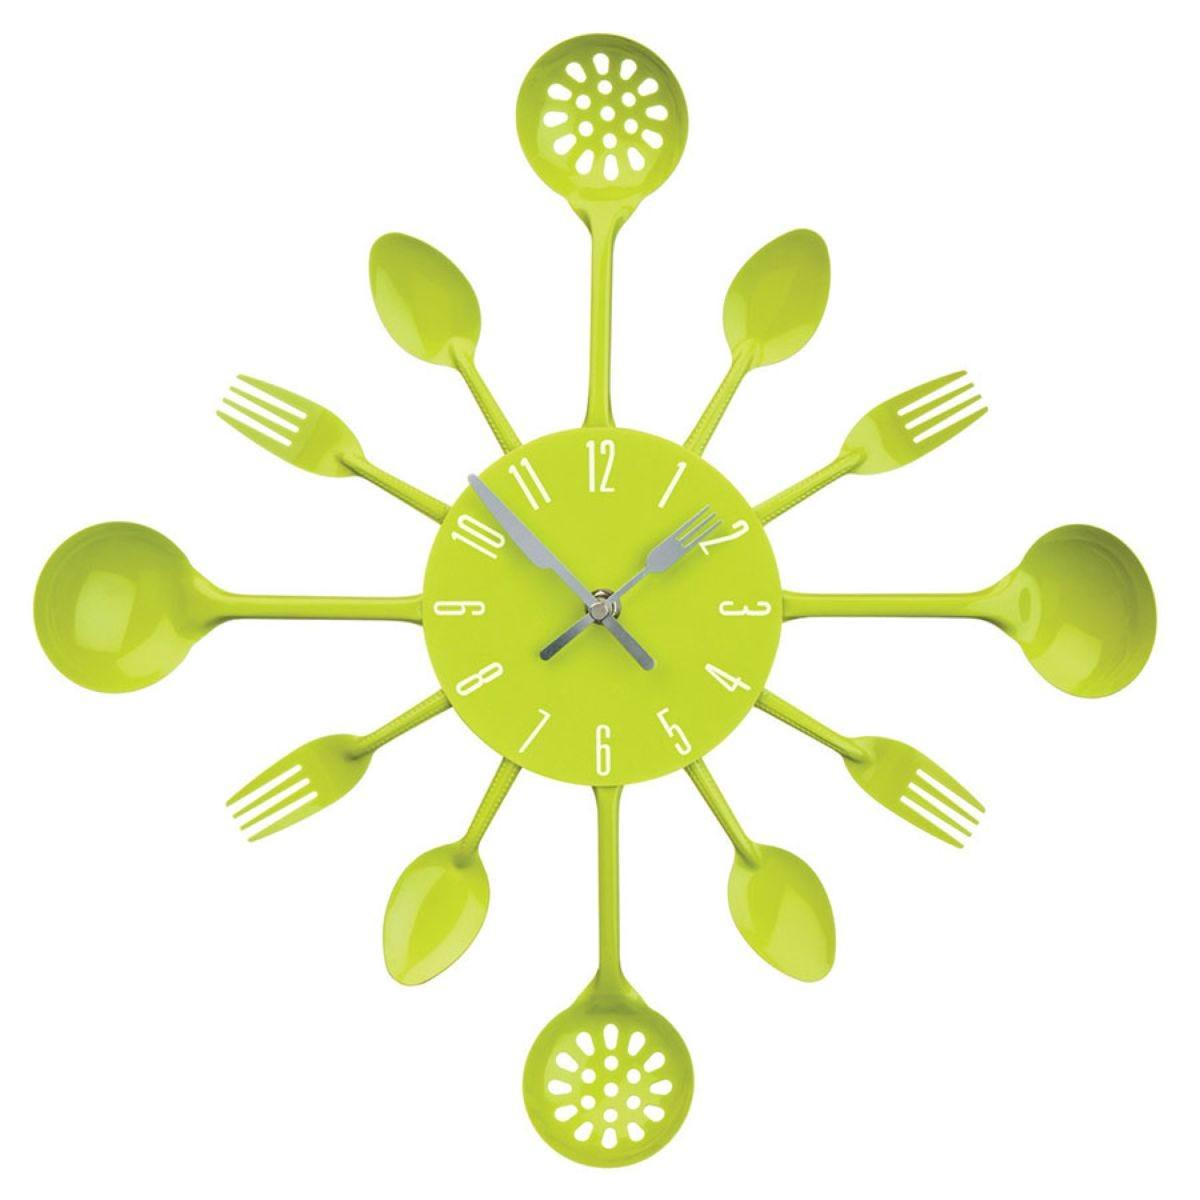 Cutlery Wall Clock - Lime Green